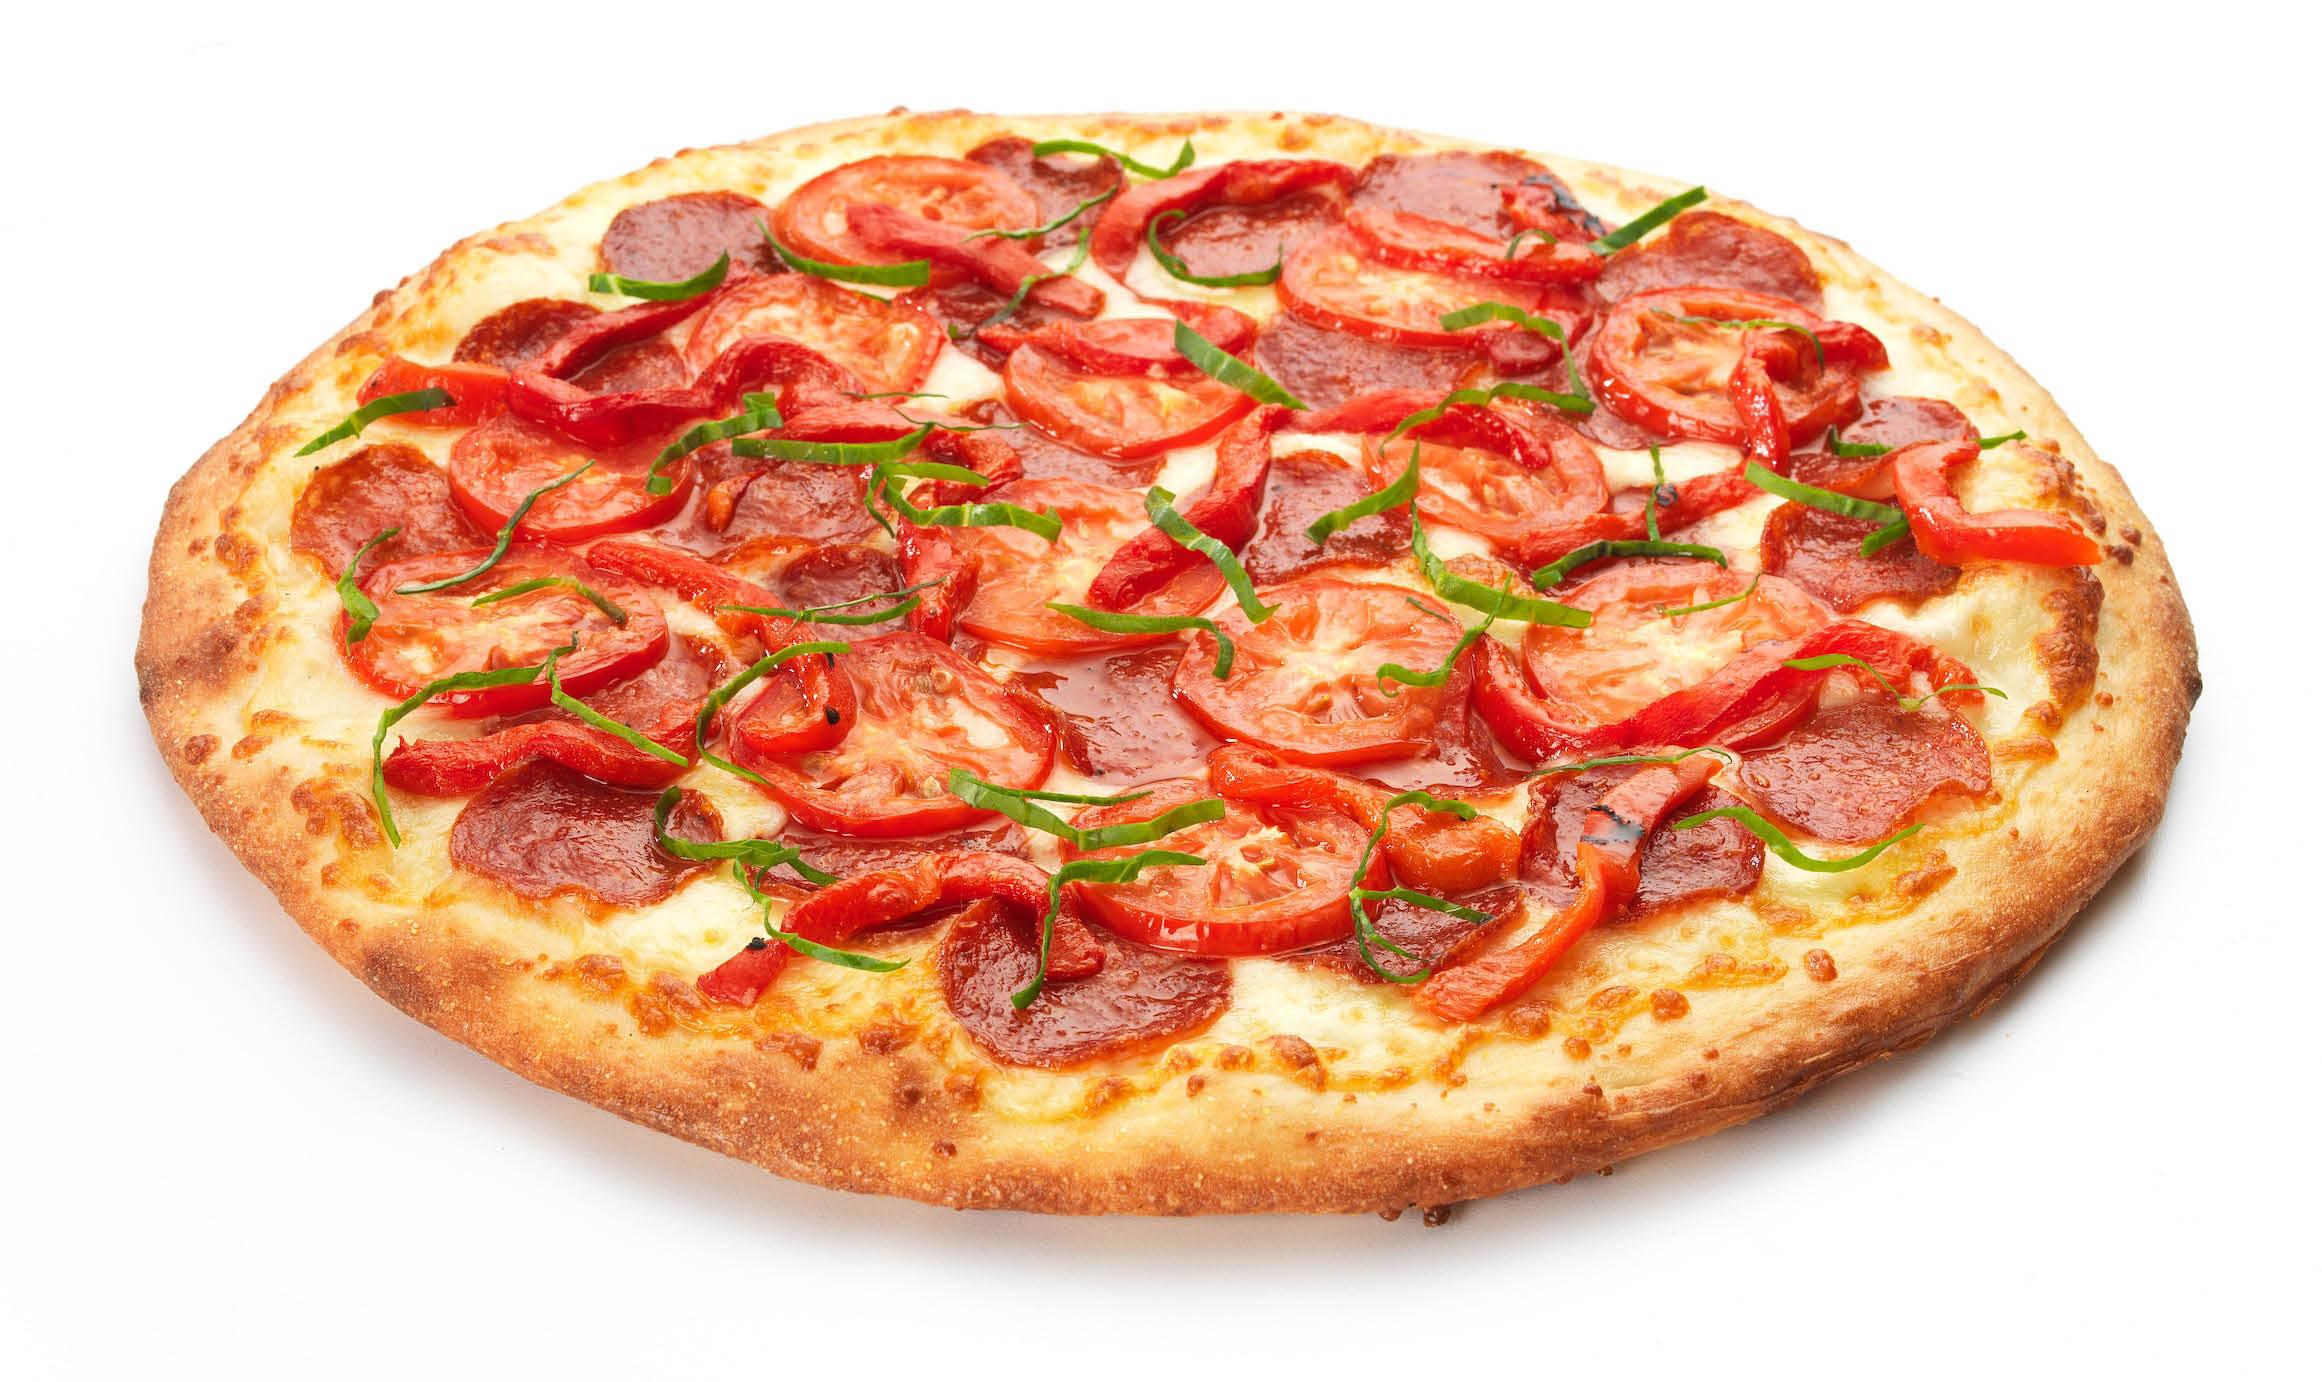 New York pizza in Marietta, GA